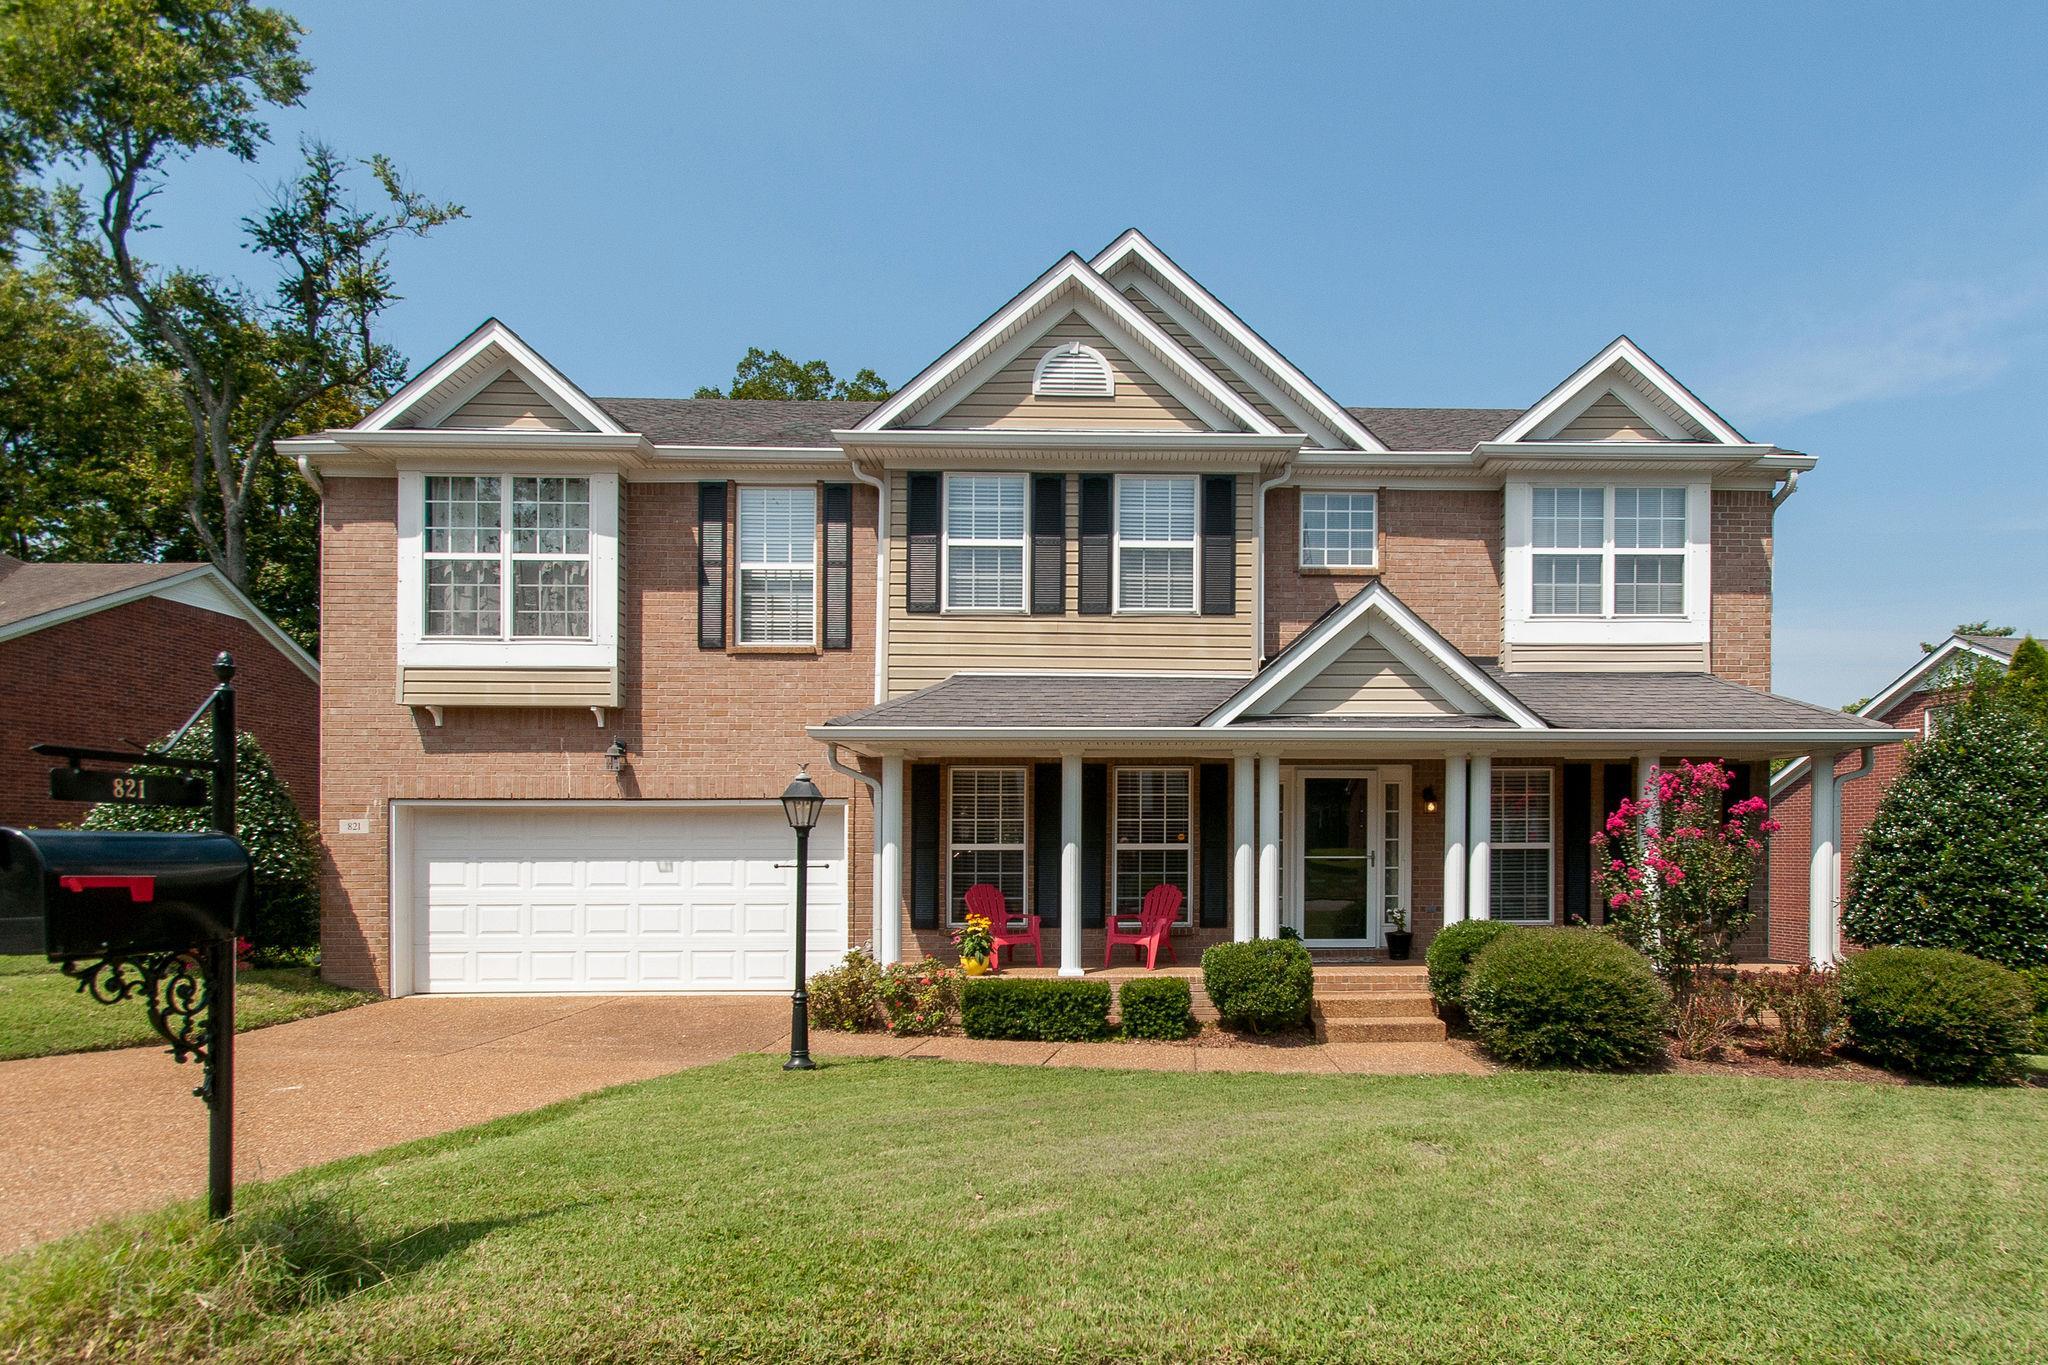 821 Banbury Way, Brentwood, TN 37027 - Brentwood, TN real estate listing